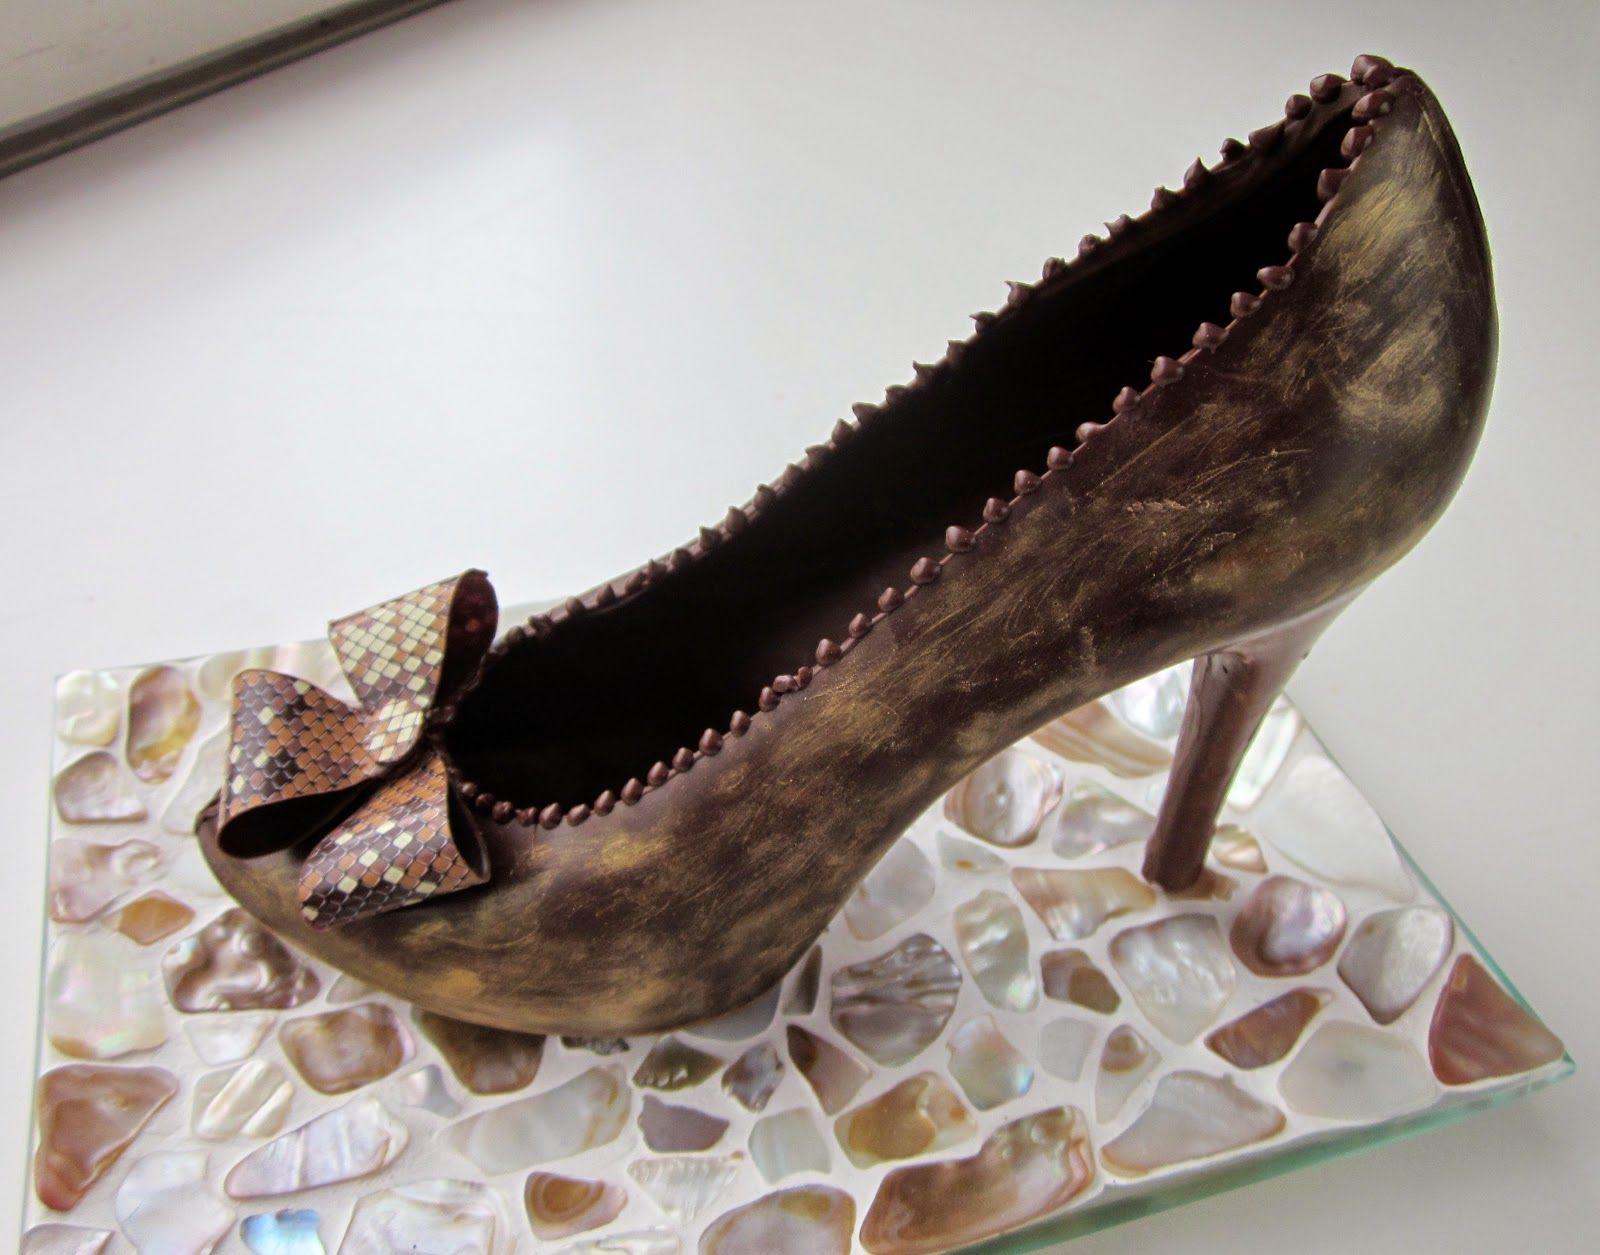 Chocolate high heels.